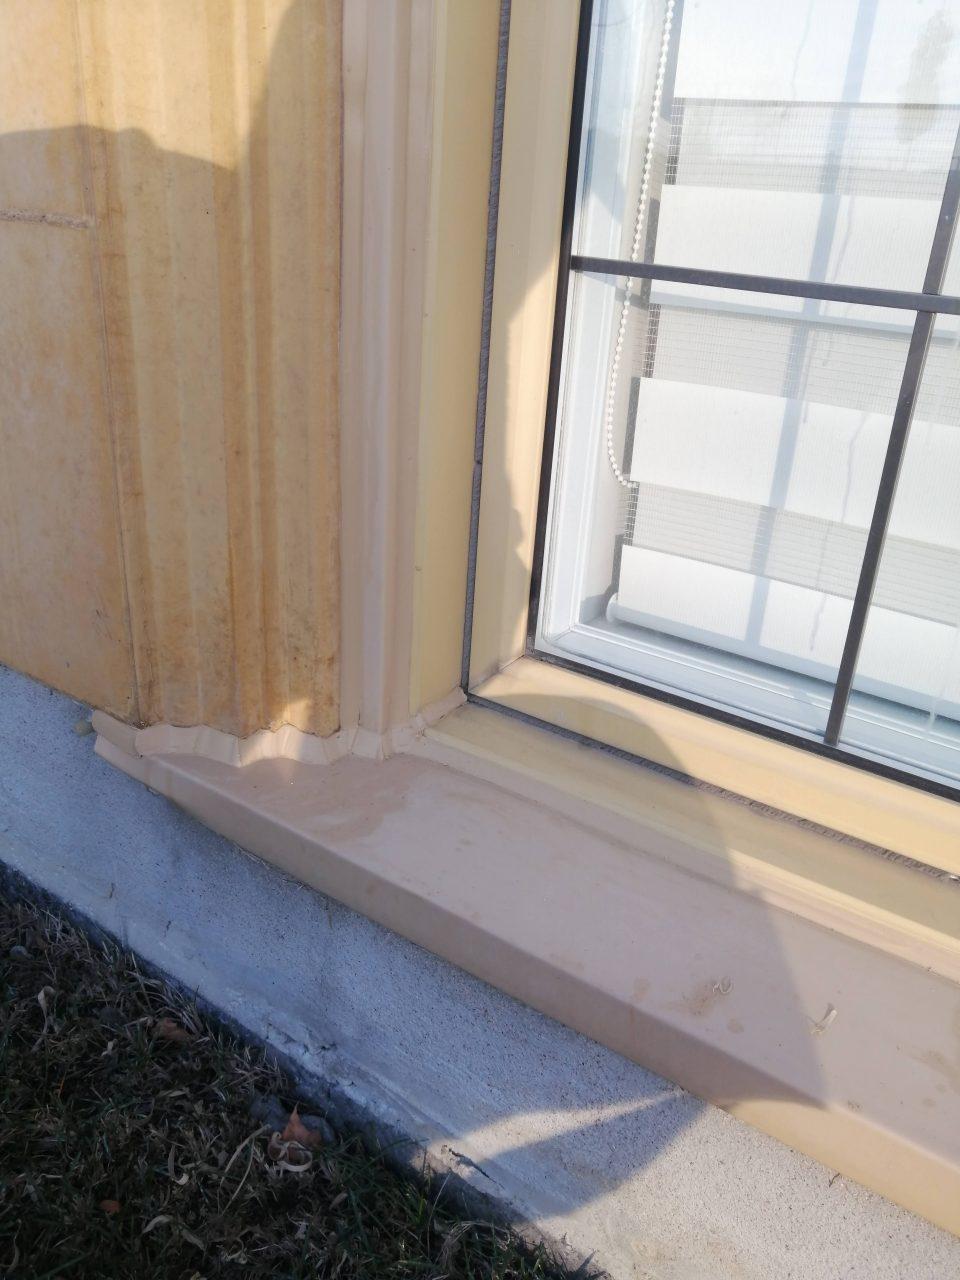 Window caulking by Calfeutrage Apex Caulking